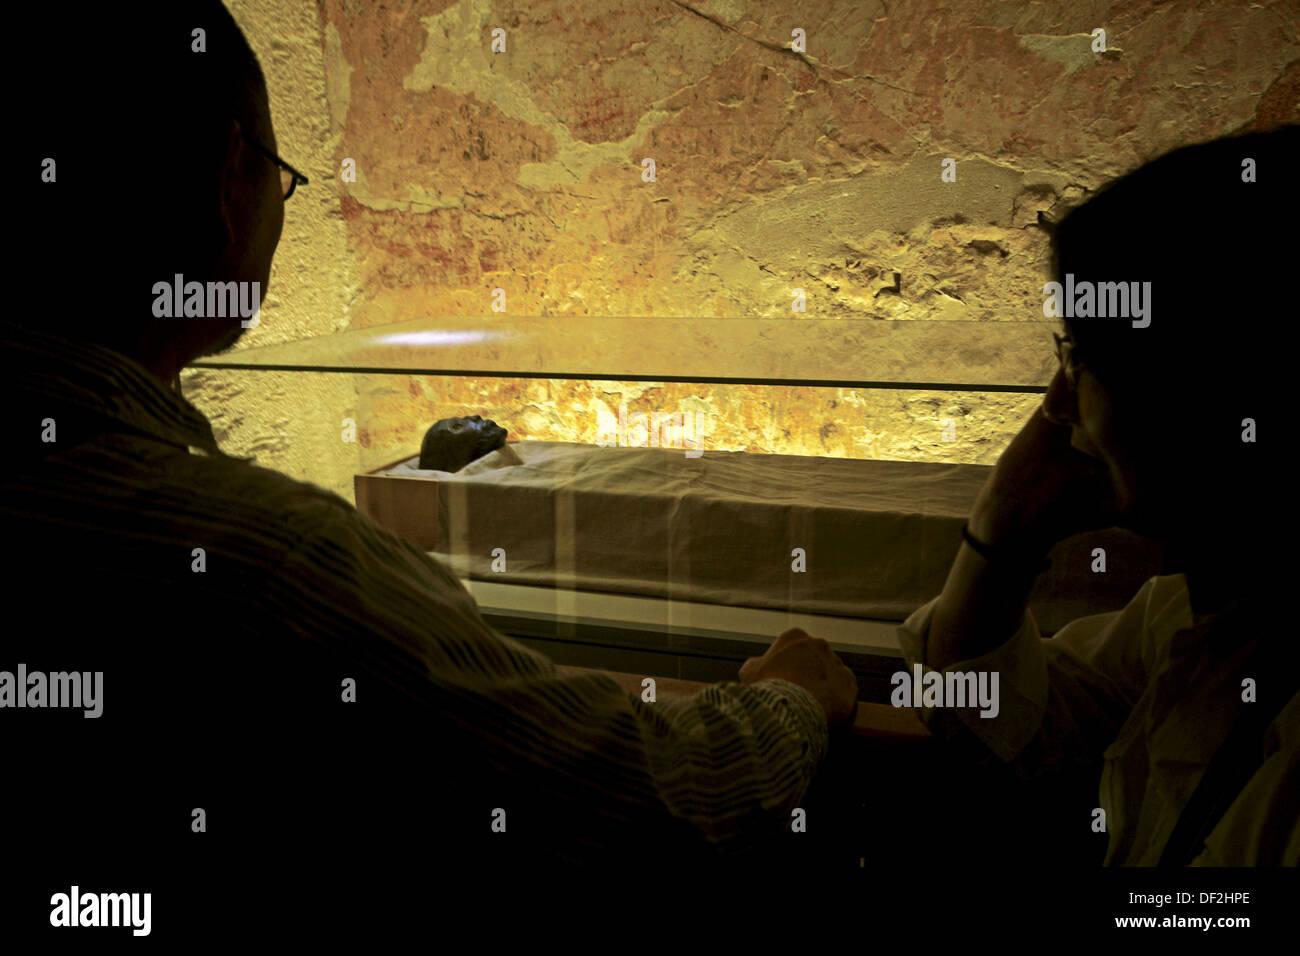 Tumb of Tut Ank Amon.  Mummy of Tut Ank Aman. Luxor west bank. Egypt - Stock Image